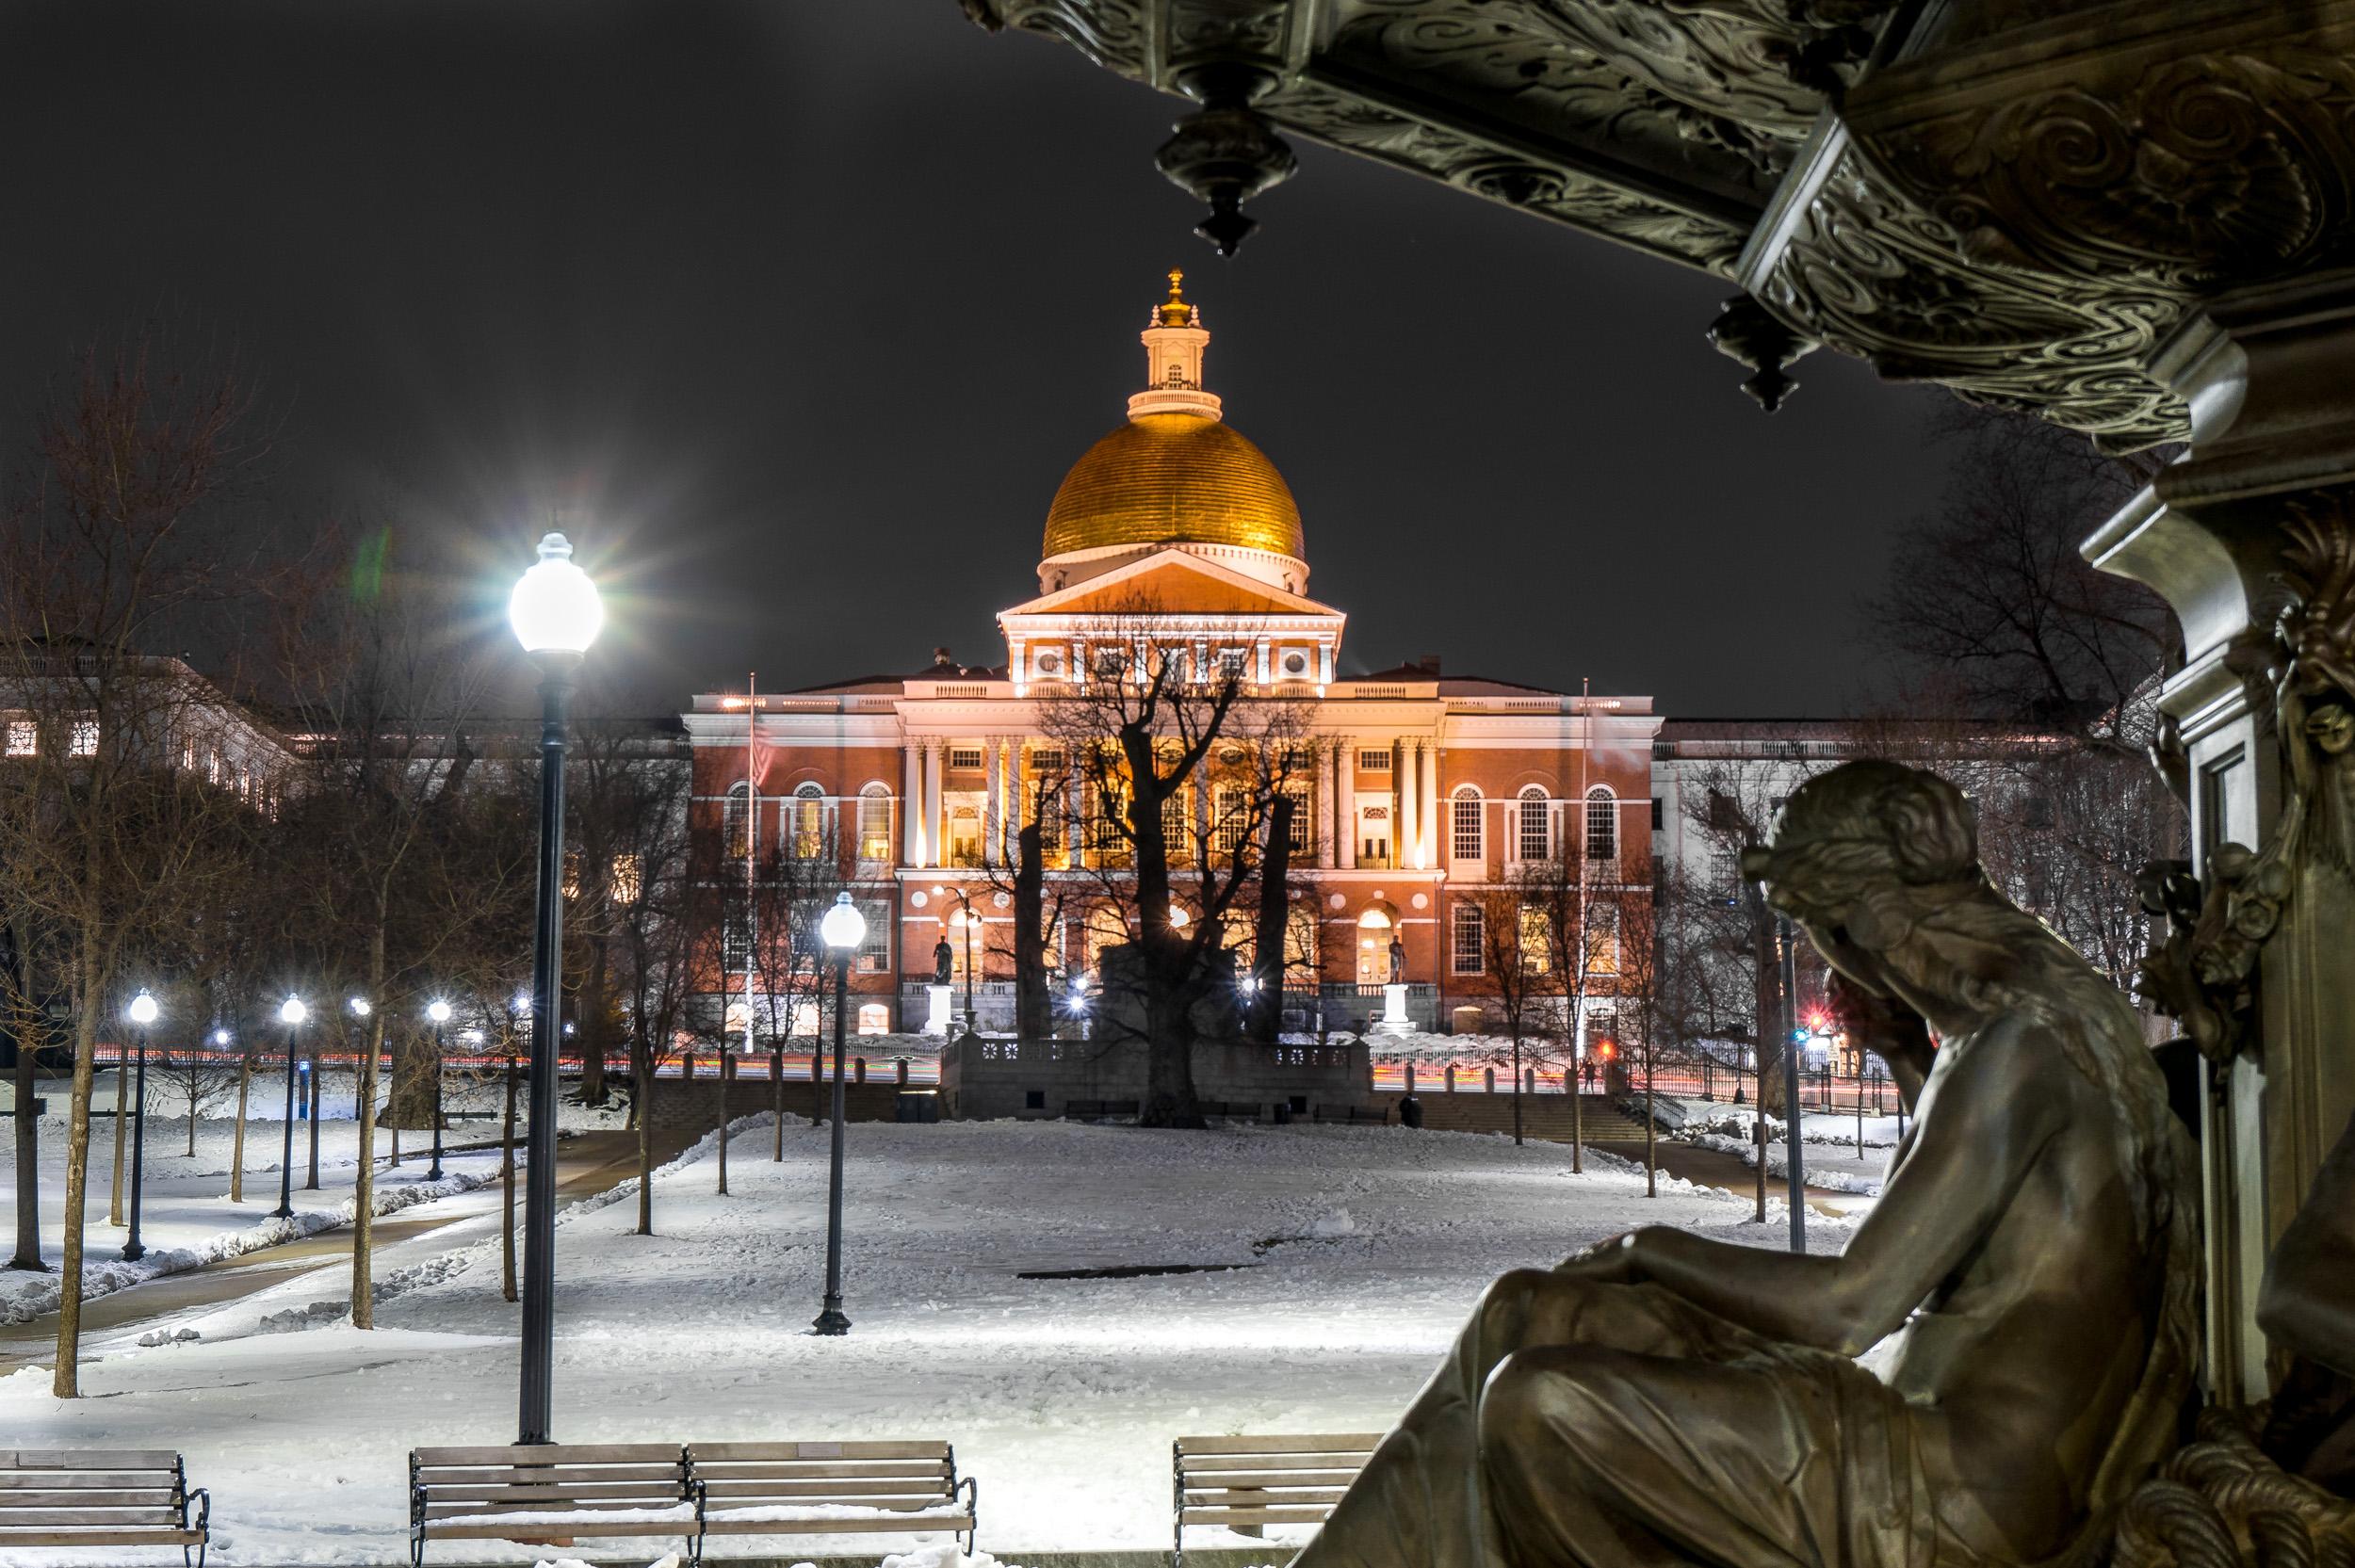 State House - Boston, MA